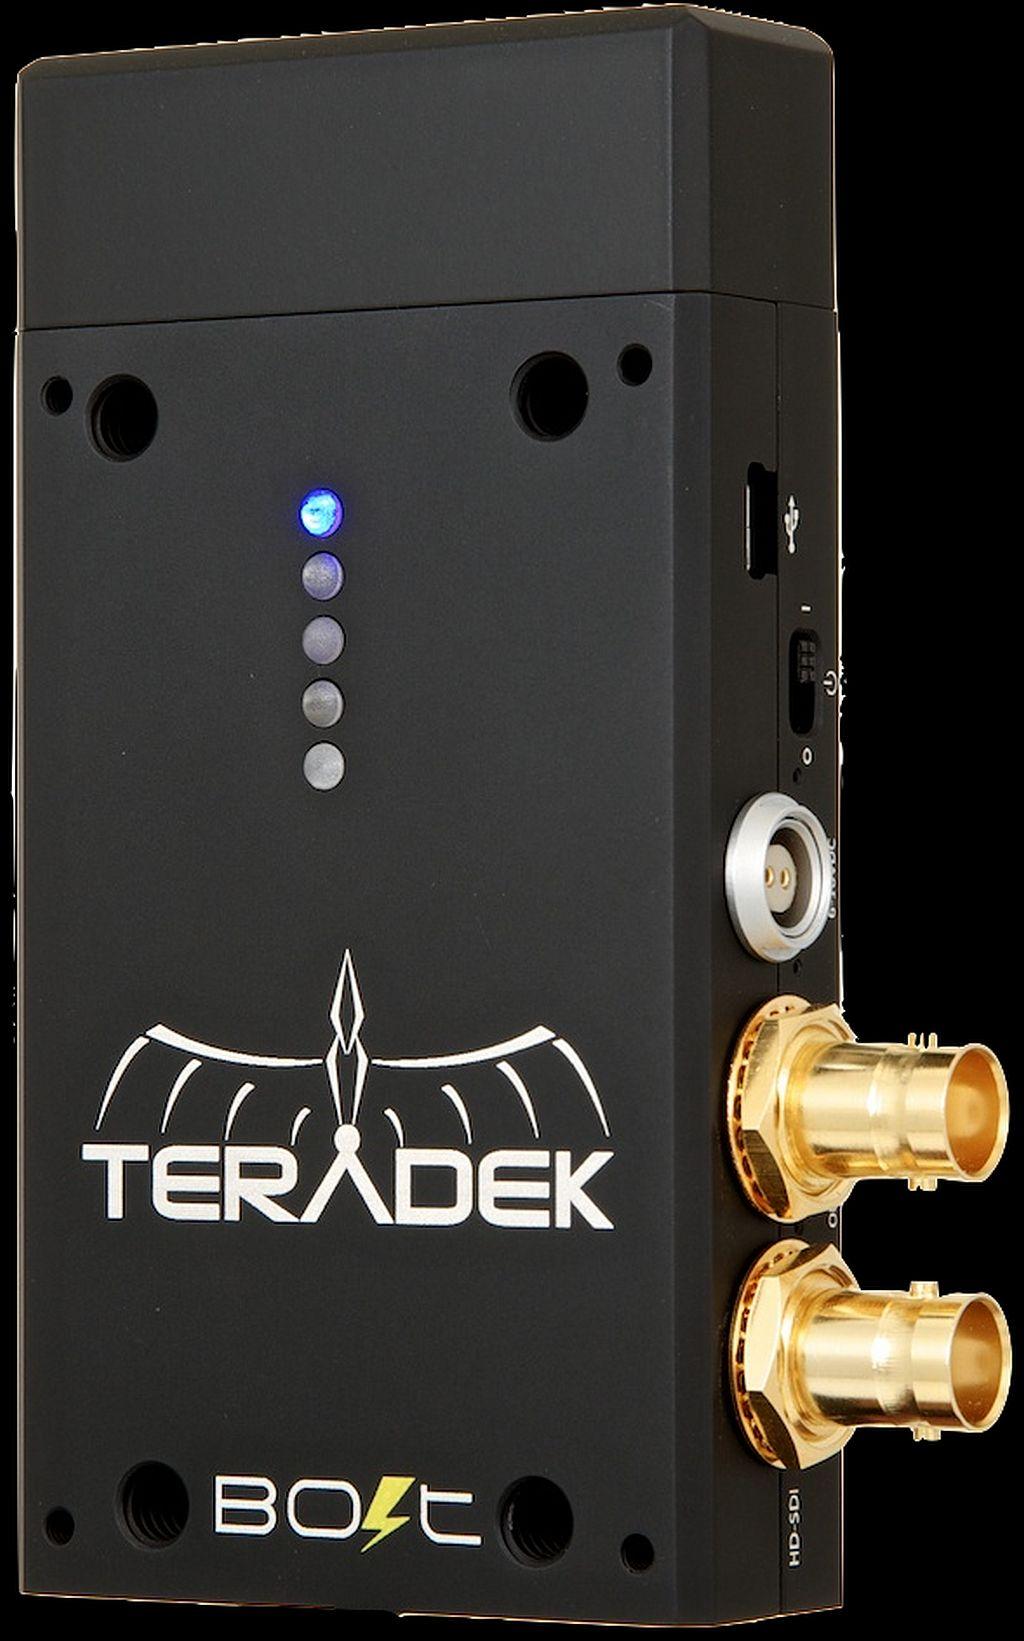 Teradek Bolt Wireless SDI: transmisión inalámbrica, ahora sin retardo